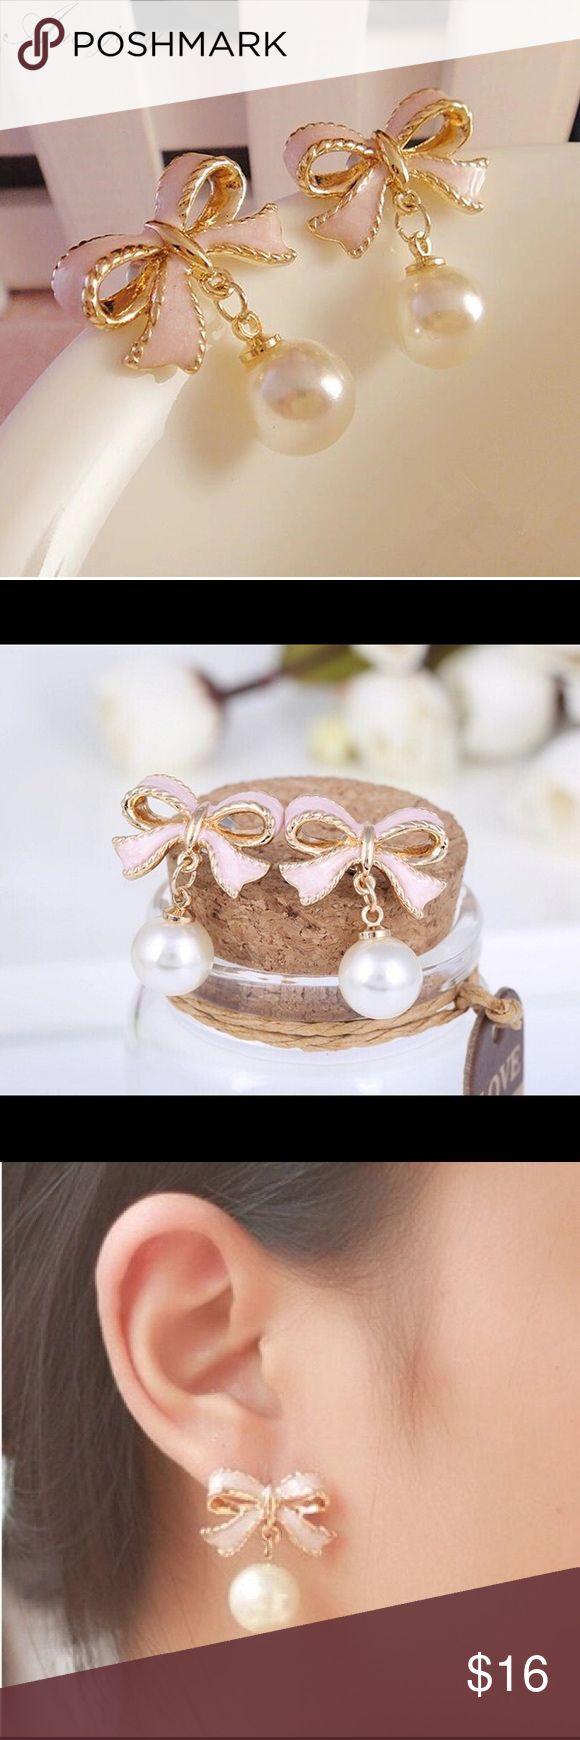 Women's/ Girls Pink Enamel & Pear Drop Earrings High Quality Delicate Gold Color Pink Drops Of Oil Butterfly Bow Knot Pearl Stud Earrings For Women QueenEstherShop Jewelry Earrings